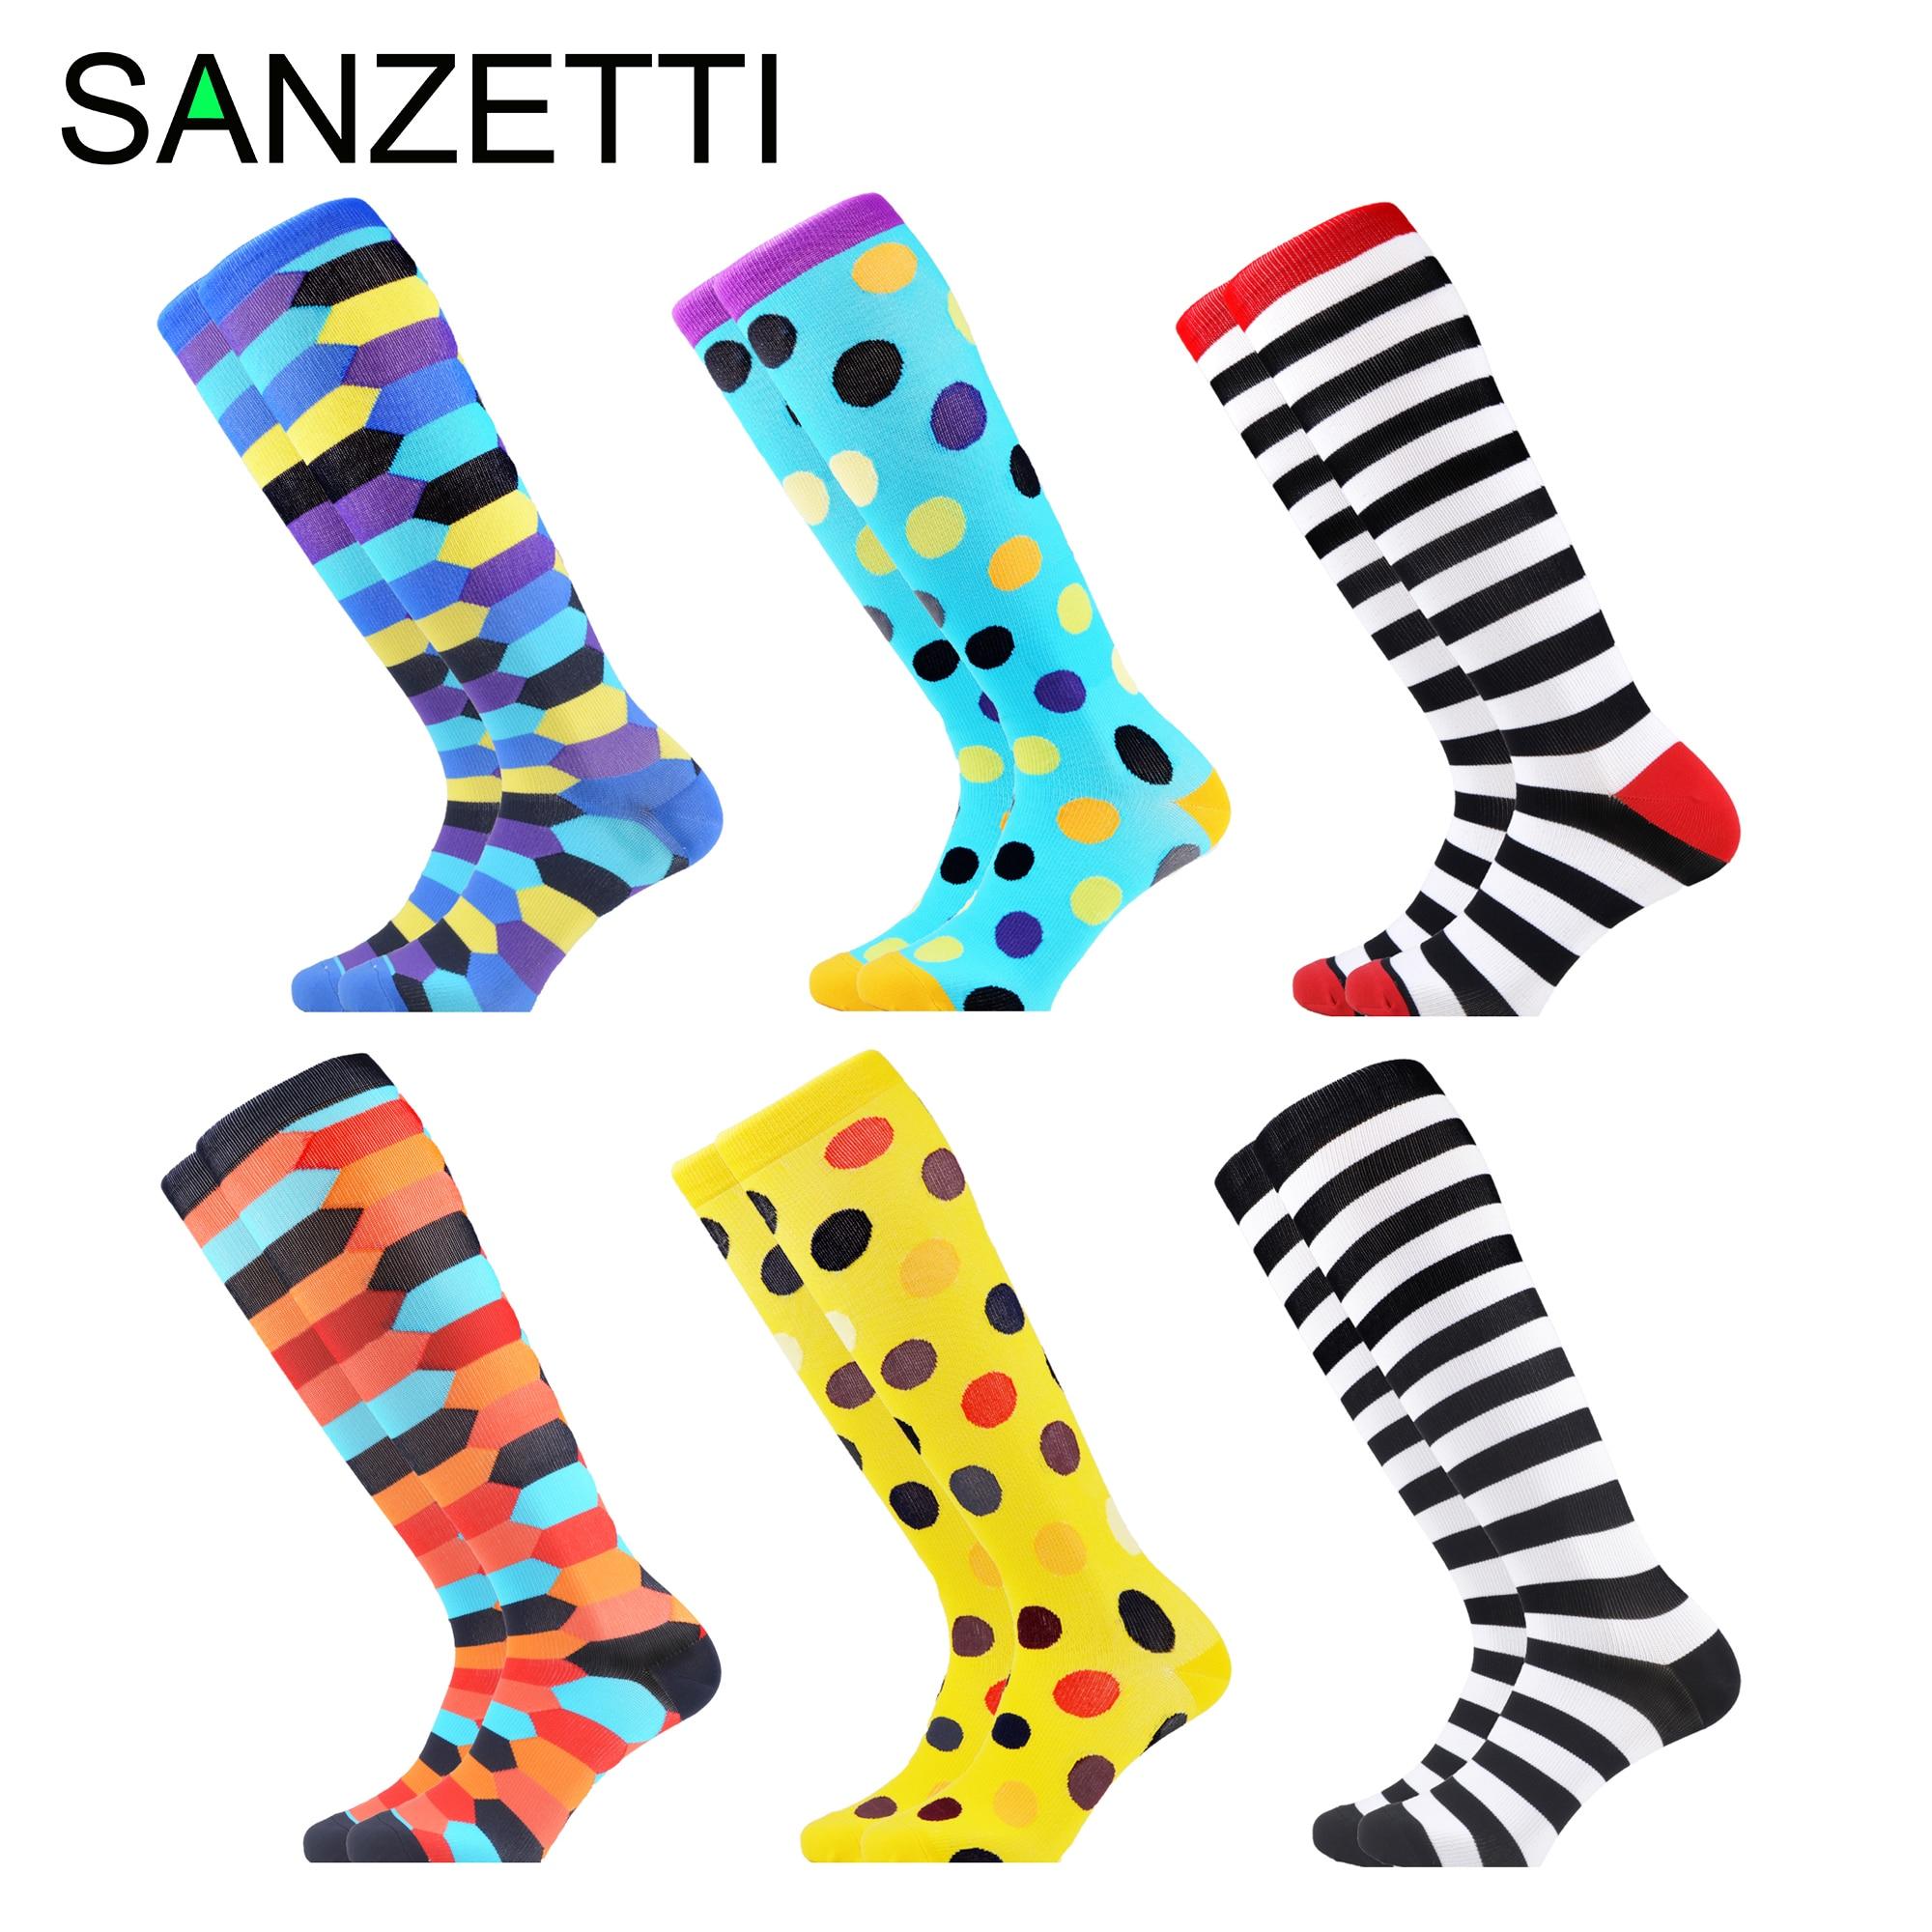 SANZETTI 6 Pairs/Lot Women's Colorful Below Knee Design Leg Support Stretch Cotton Compression Socks Anti-Fatigue Happy Socks